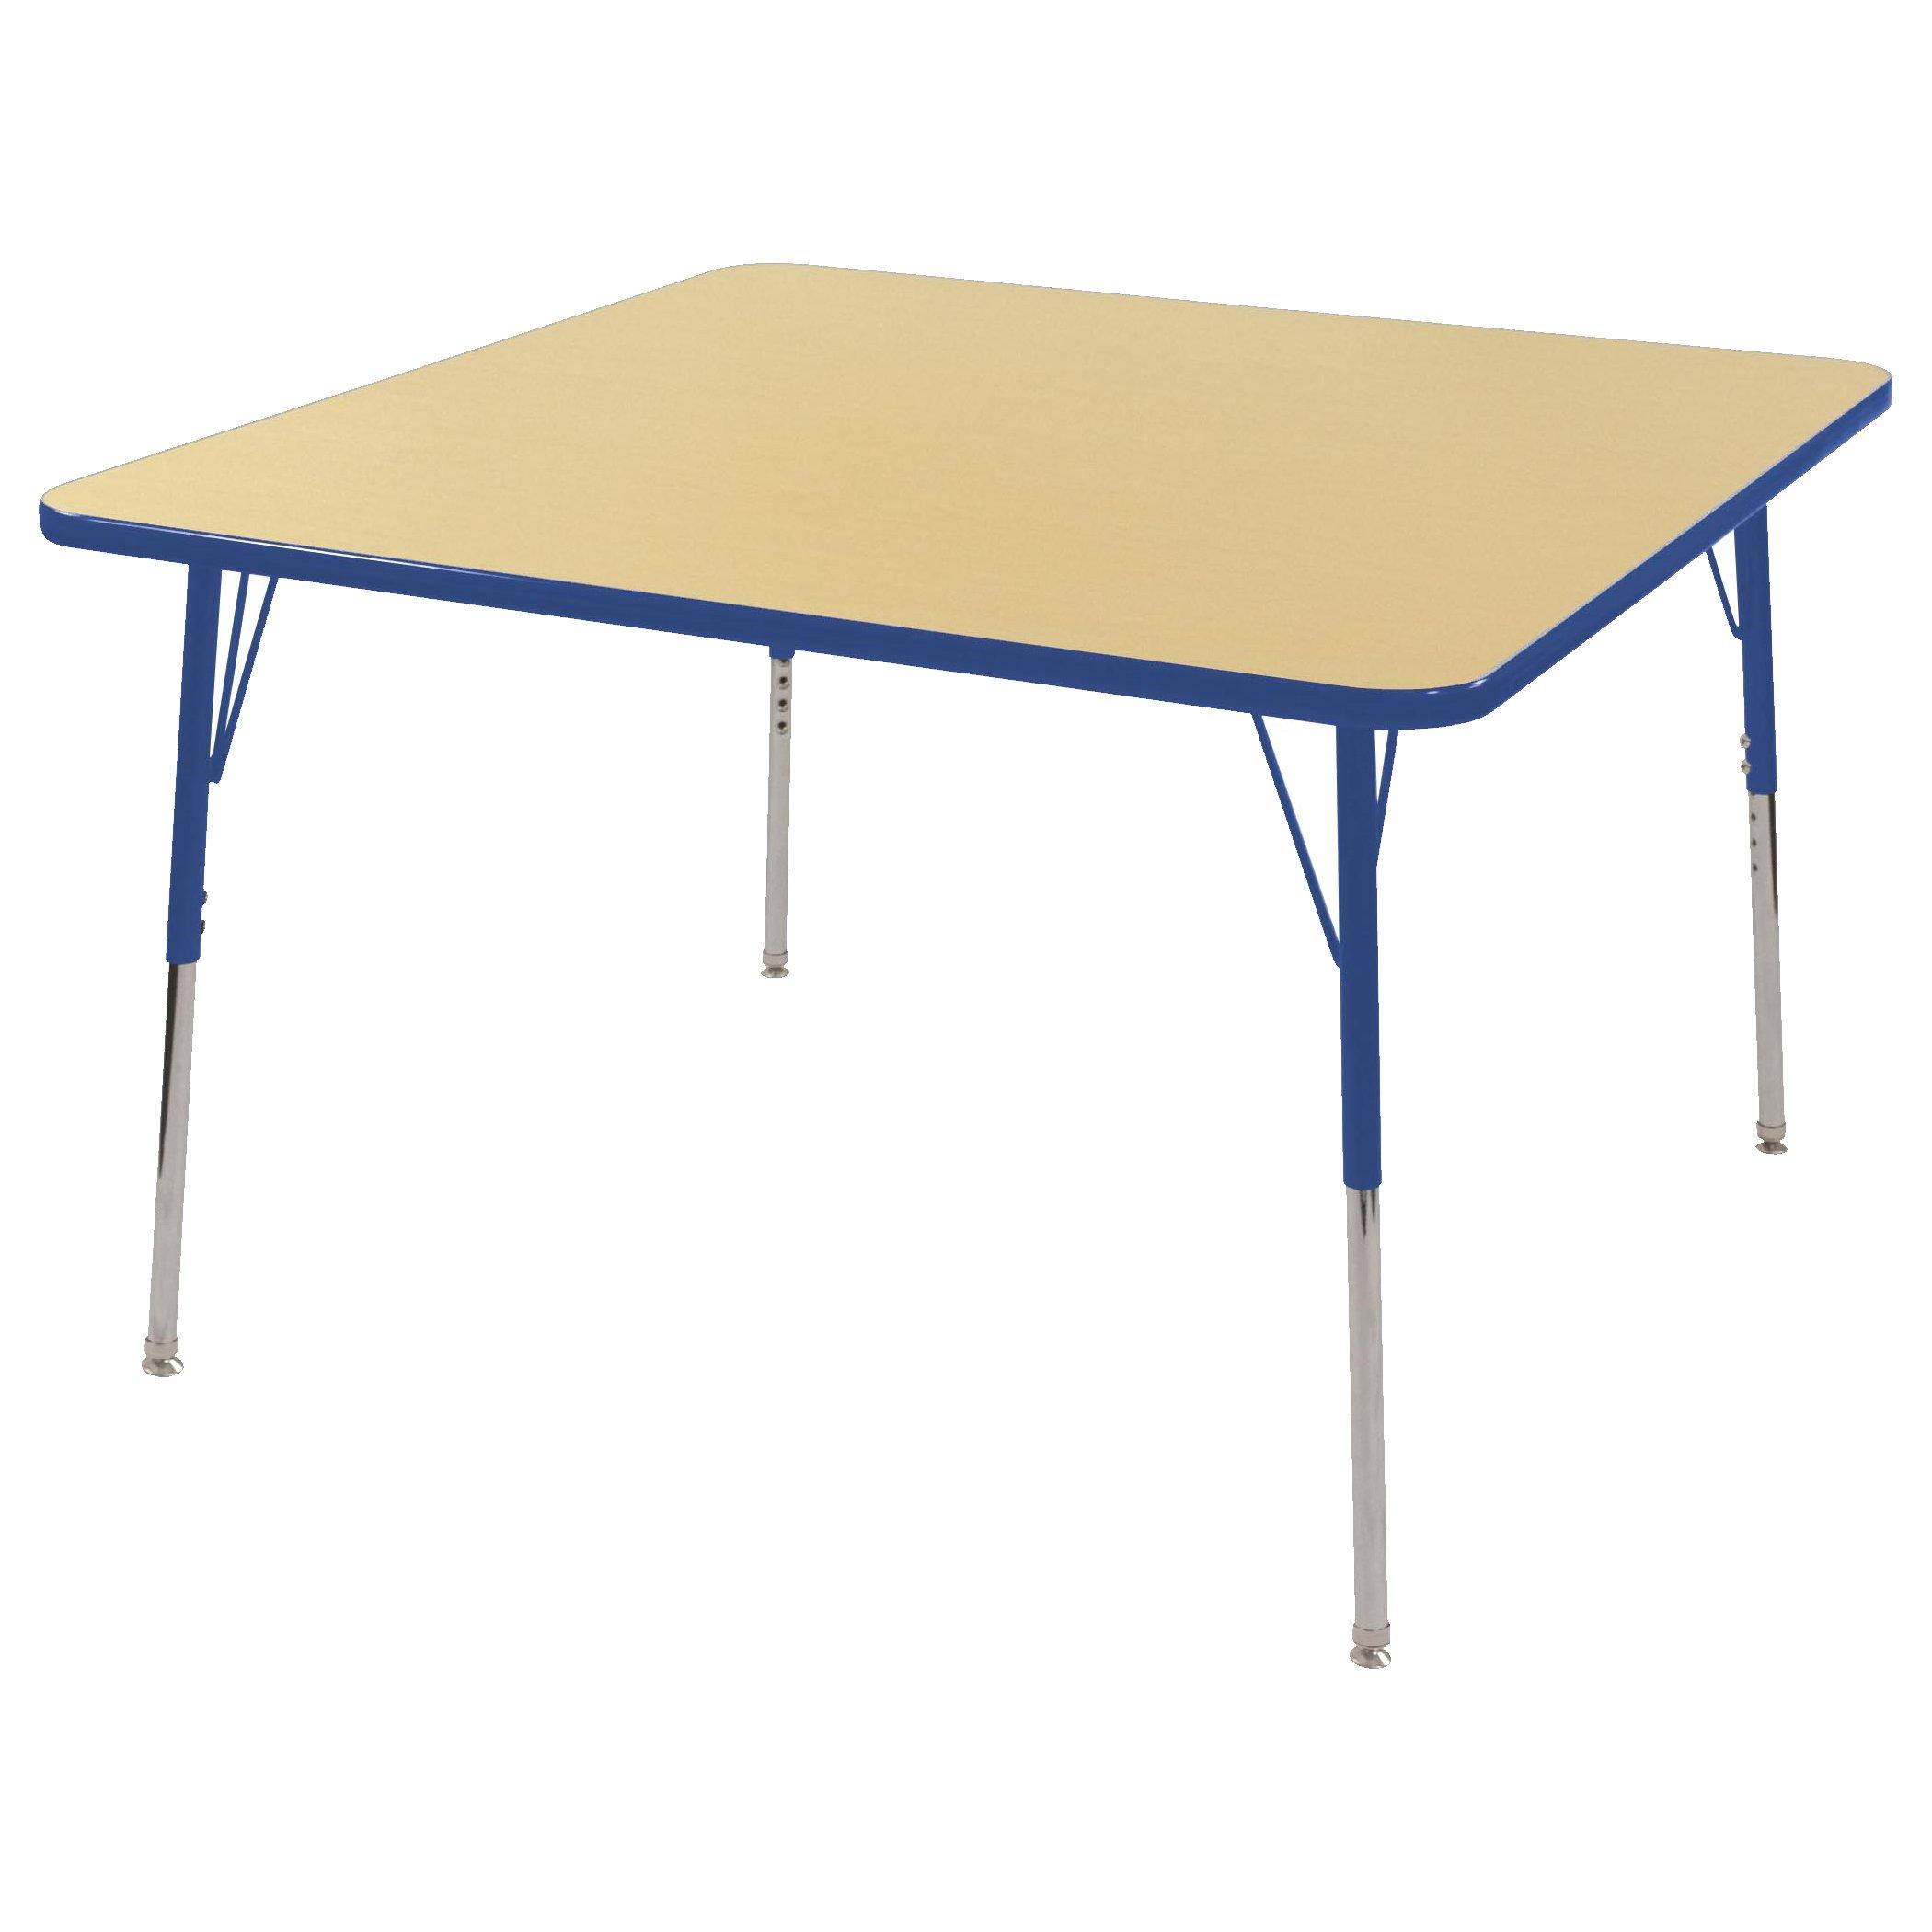 ECR4Kids 48'' Square Activity School Table, Standard Legs w/Swivel Glides, Adjustable Height 19-30 inch (Maple/Blue)